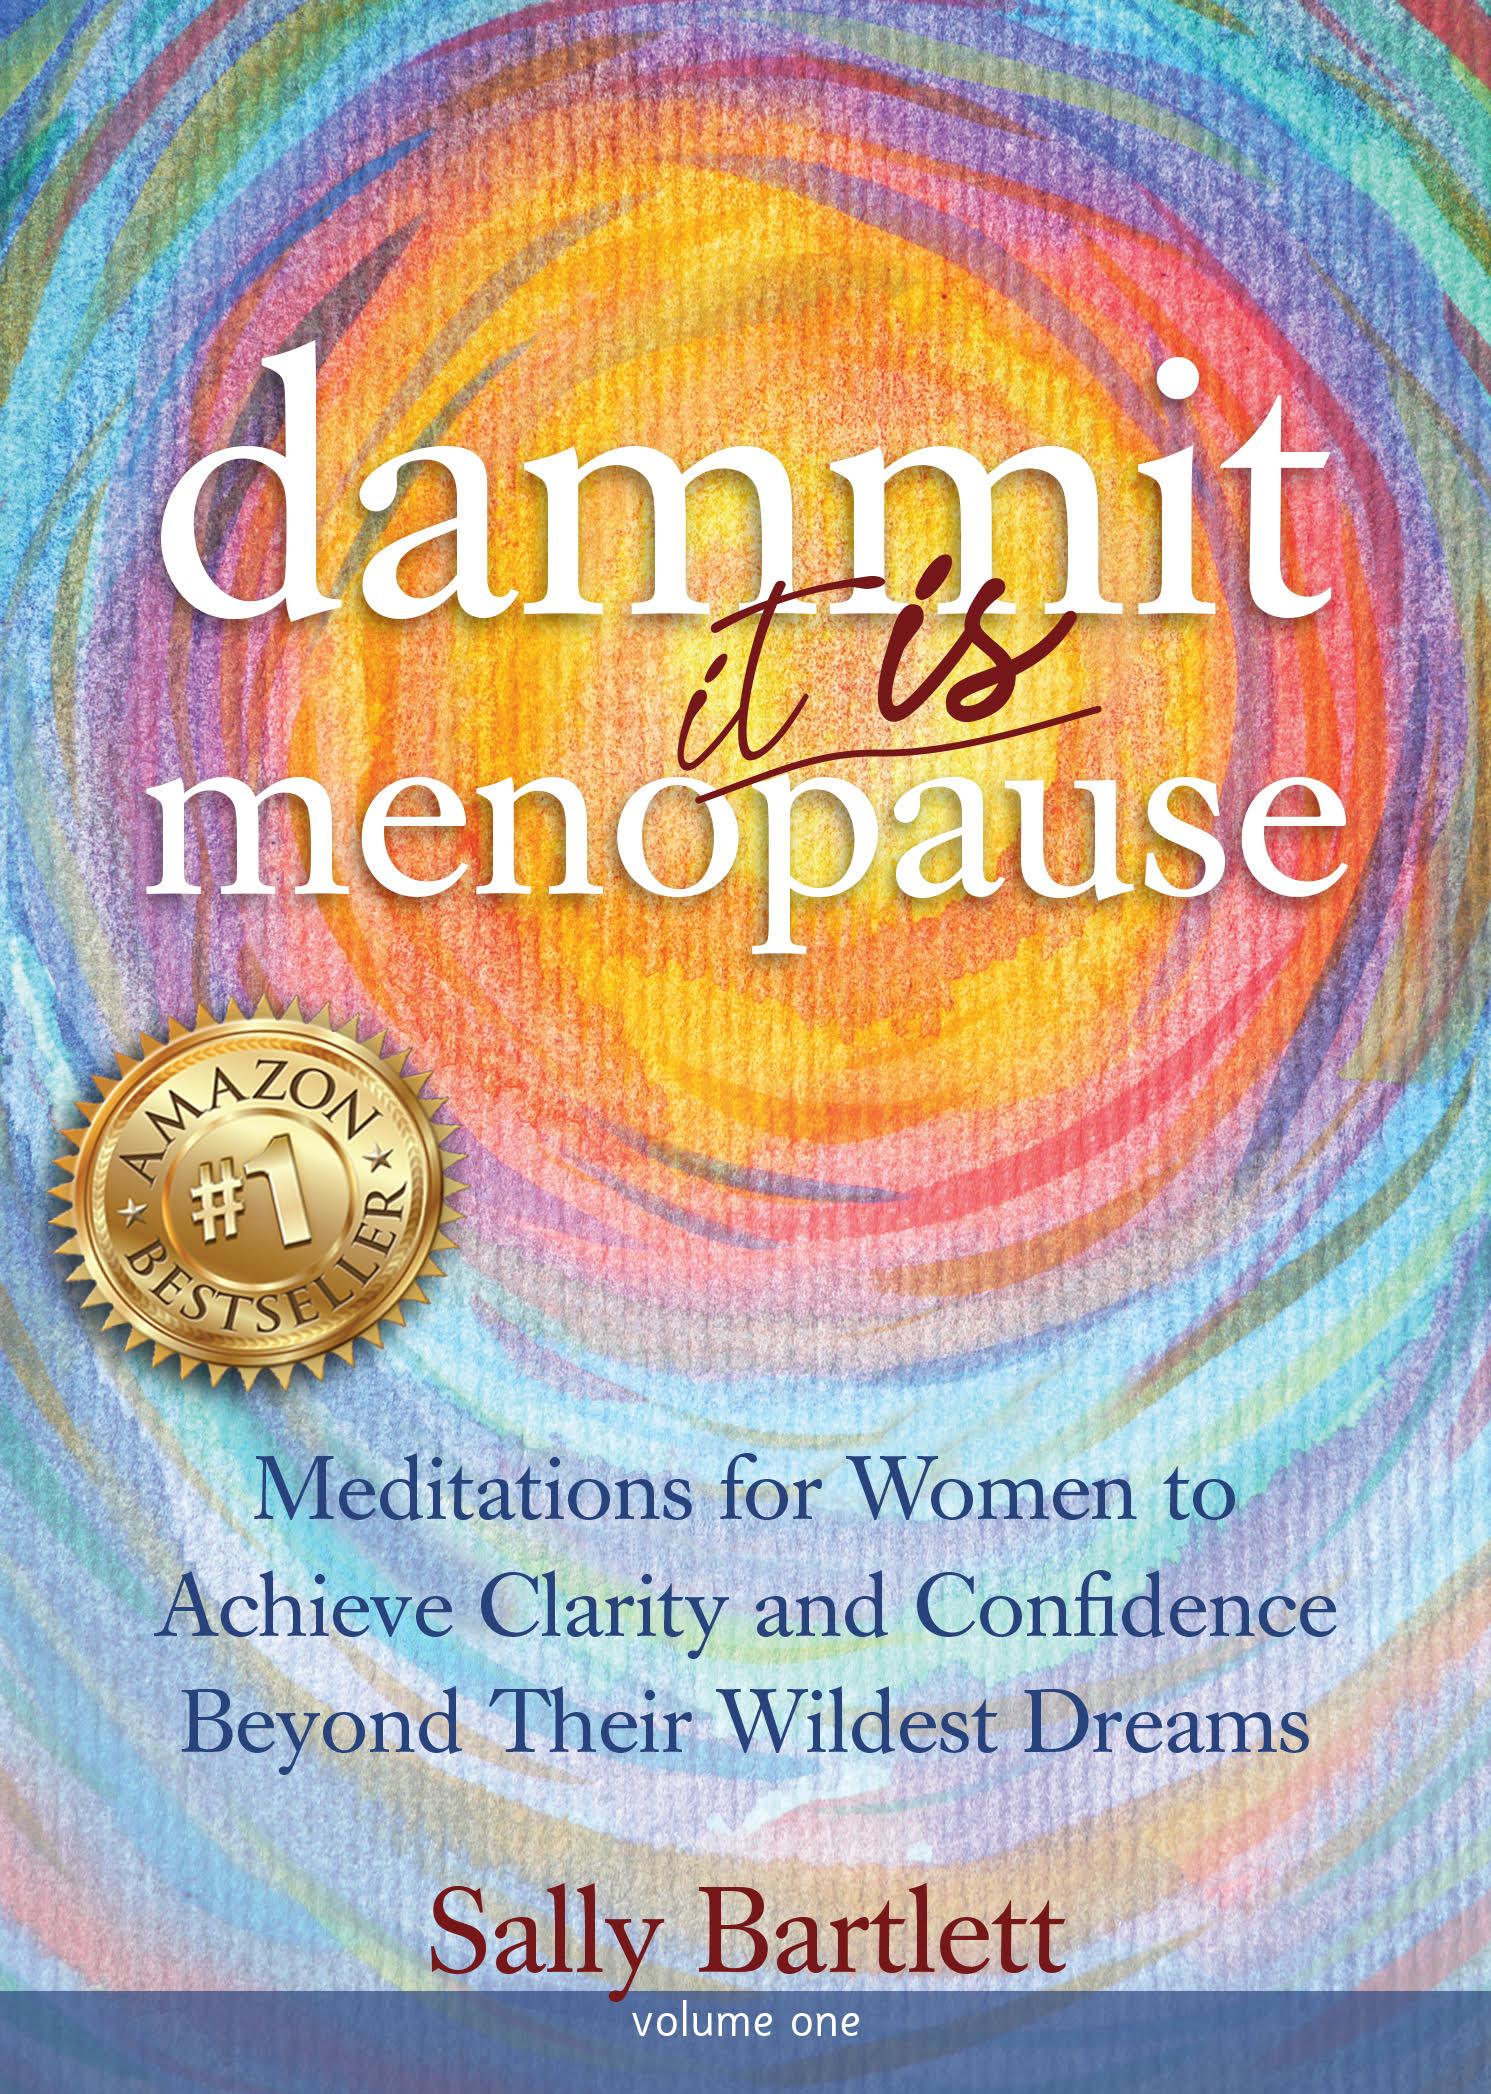 """Dammit ... It IS Menopause!"" Grabs Ten No. 1 Bestseller Categories on Amazon"